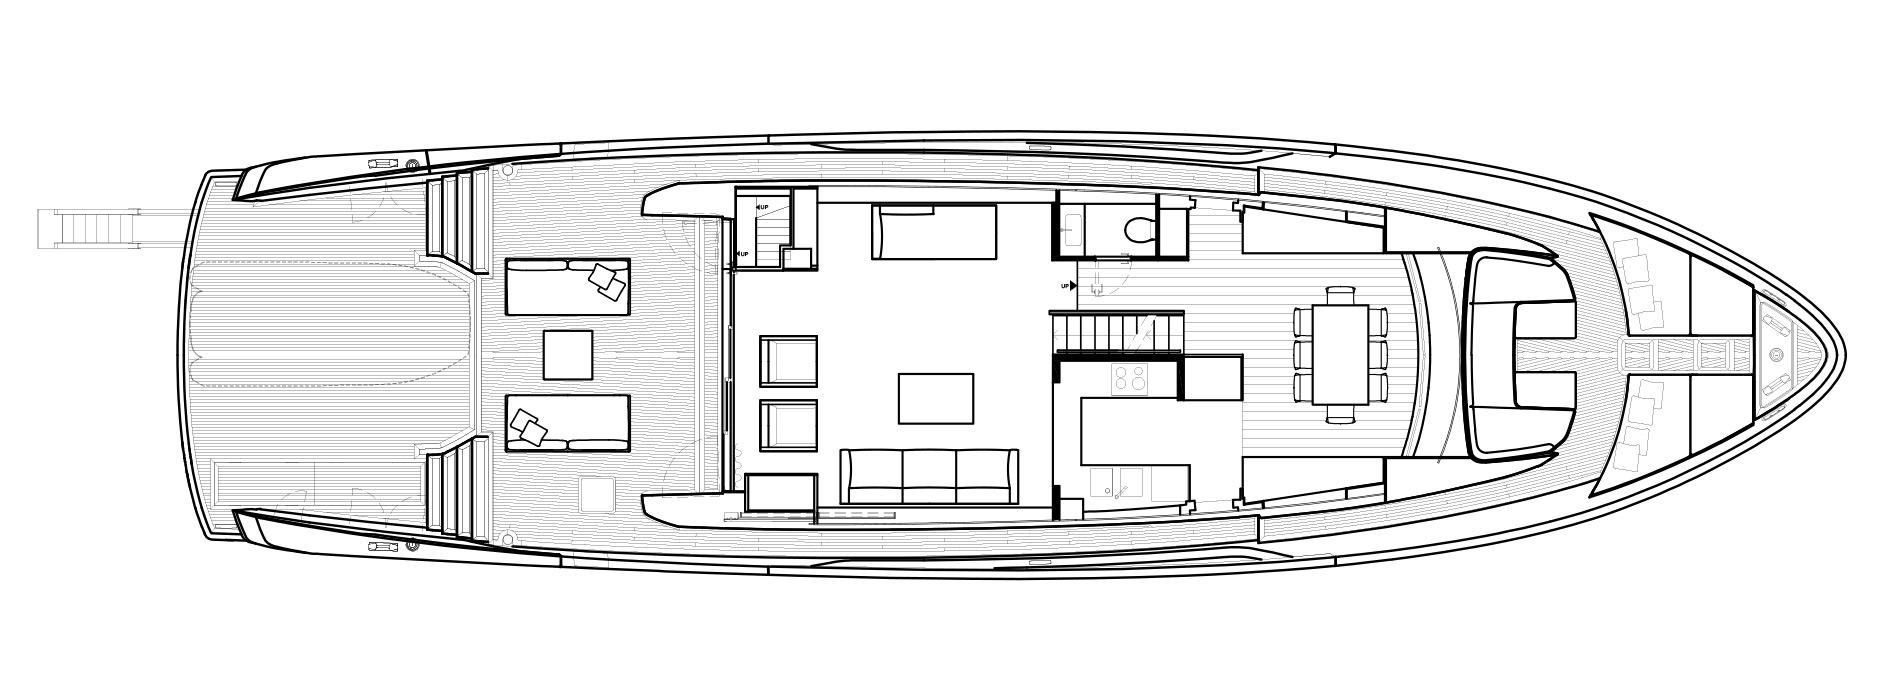 Sanlorenzo Yachts SX88 Главная палуба версия B open Galley